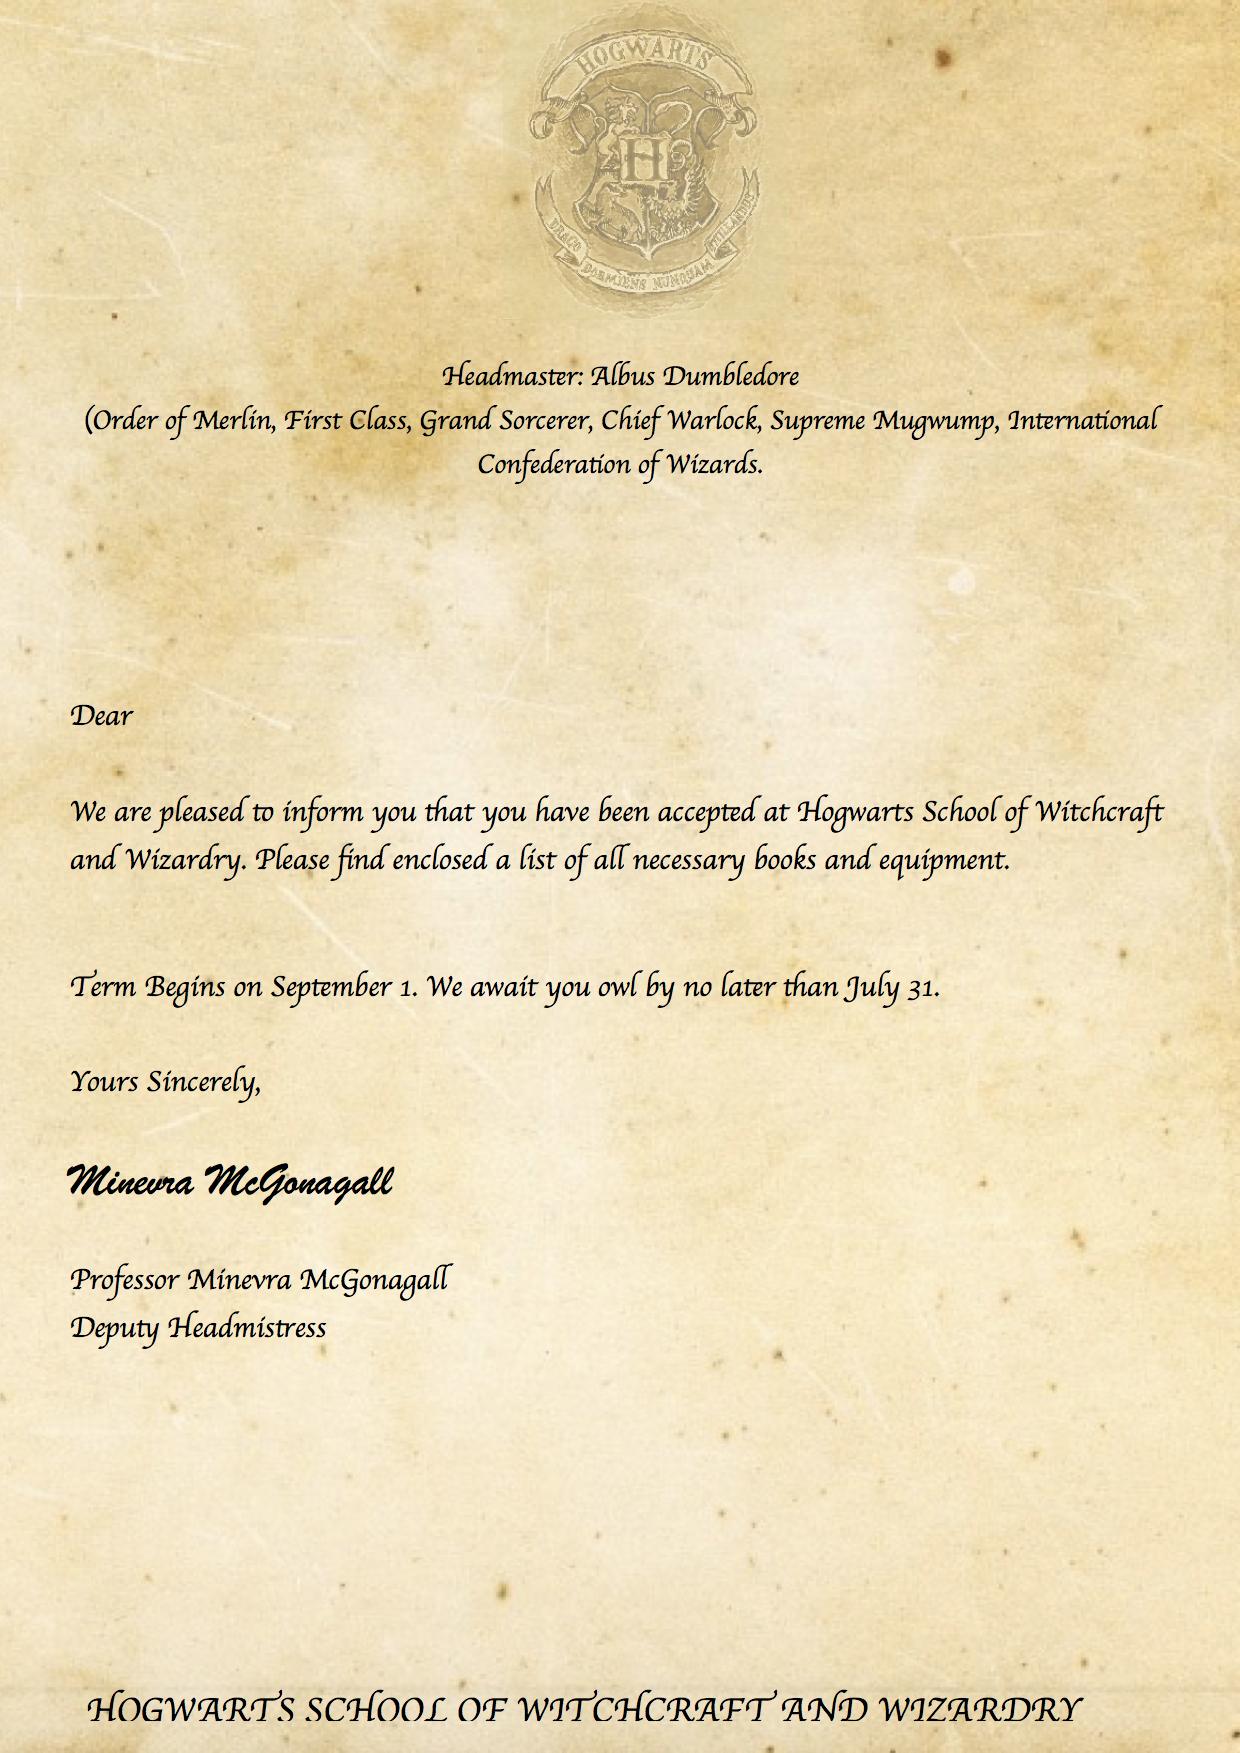 Pincaitlin Moore On Harry Potter ⚡   Harry Potter Printables - Hogwarts Acceptance Letter Template Free Printable